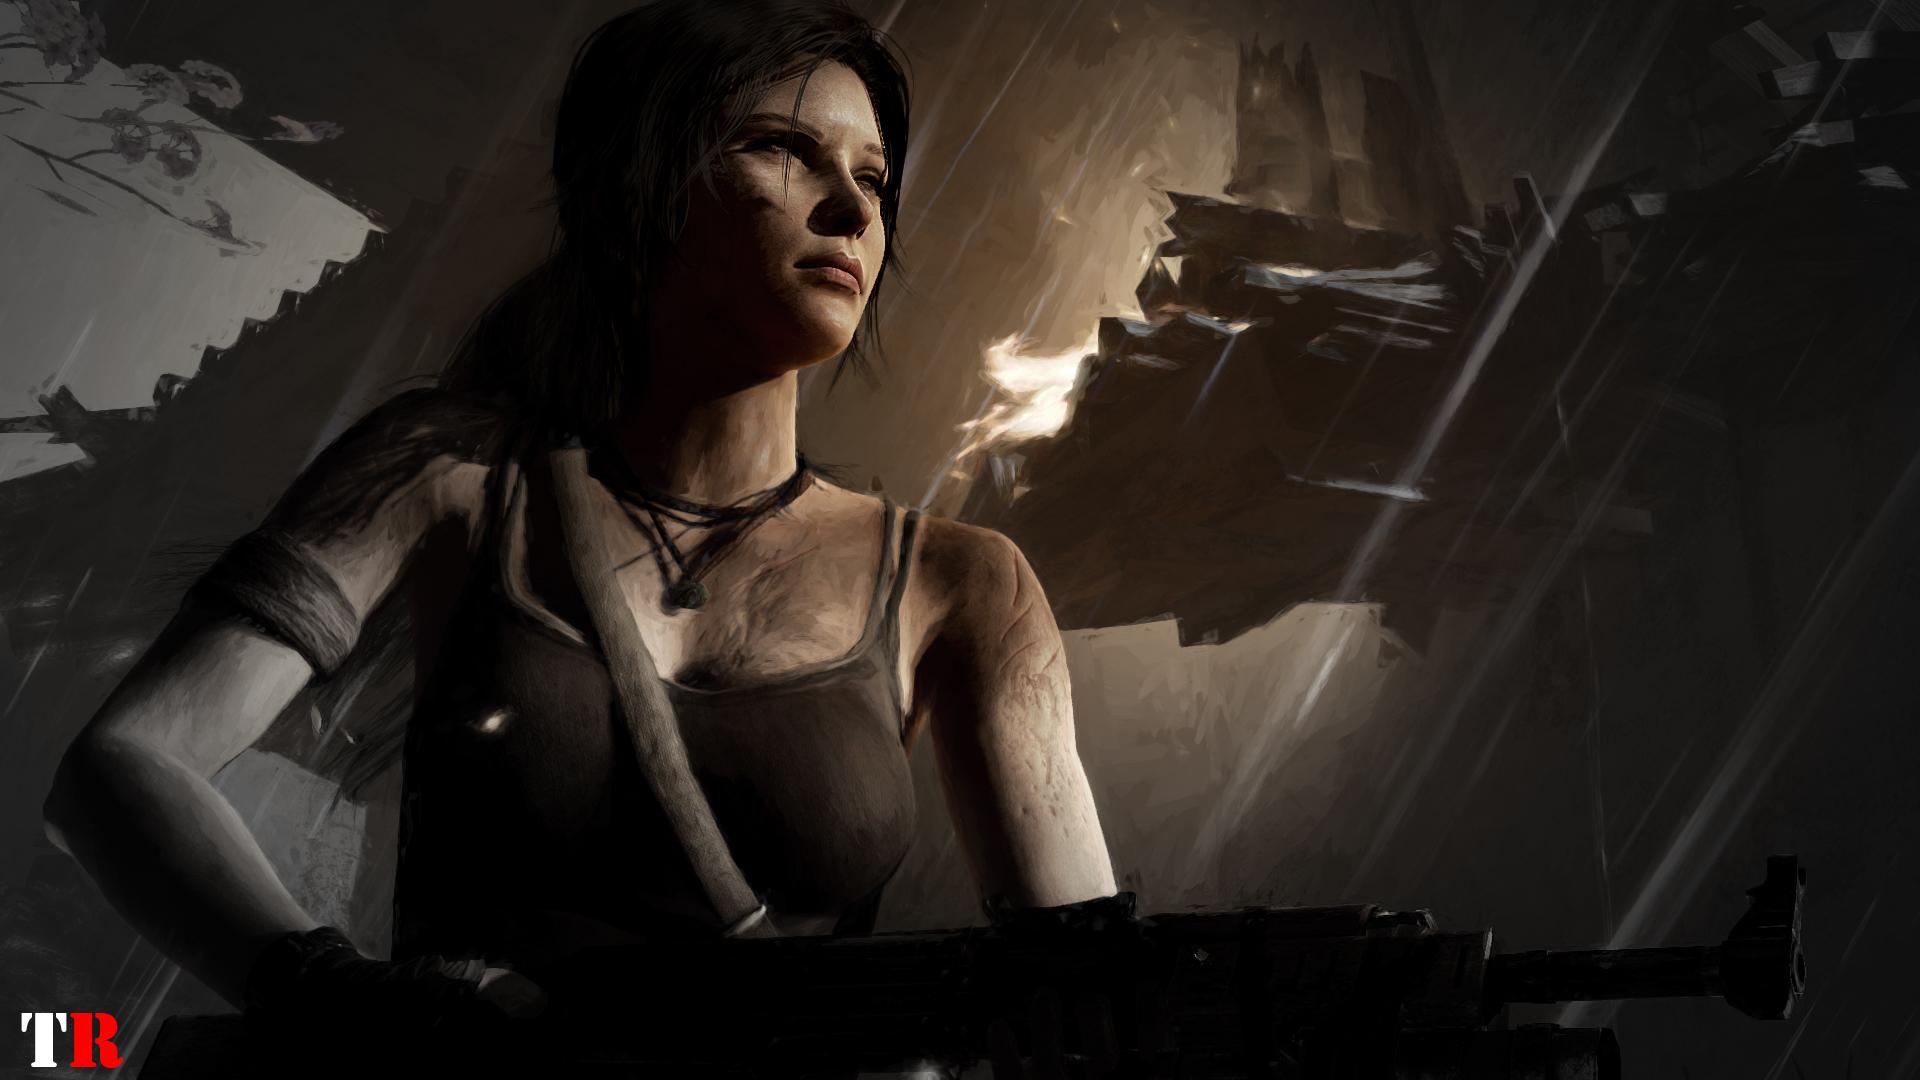 Lara Croft Tomb Raider Wallpaper Posted By Ryan Walker